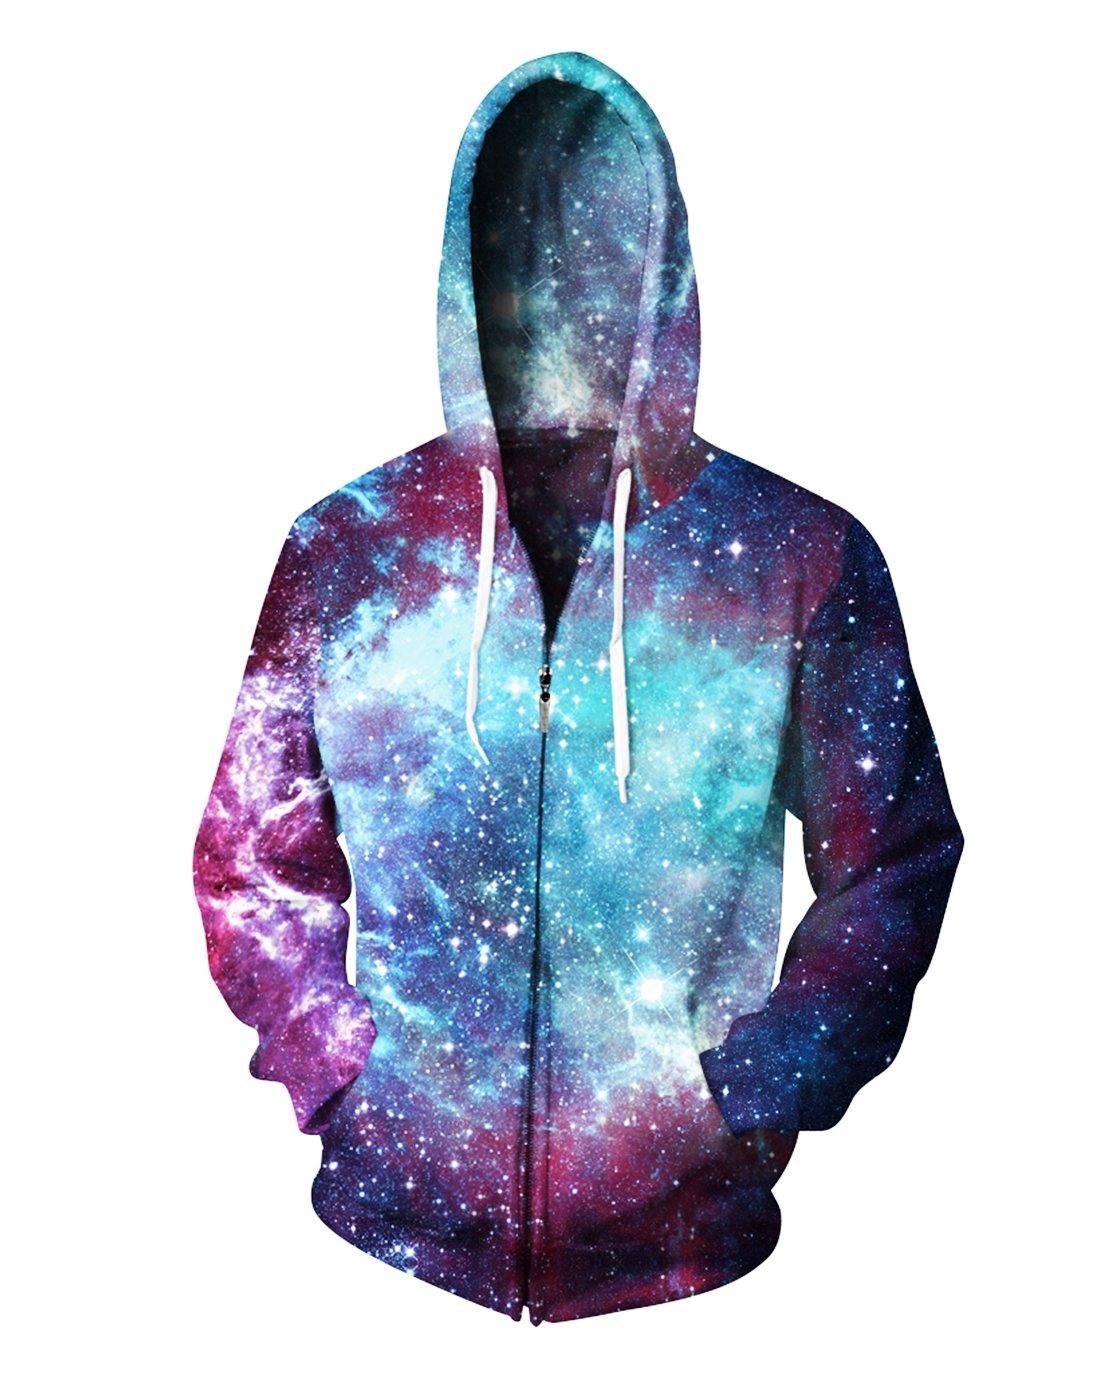 Sankill Unisex 3D Galaxy Zipper Hoodie Sweatshirt Fleece Pullover Hooded Shirts Pocket